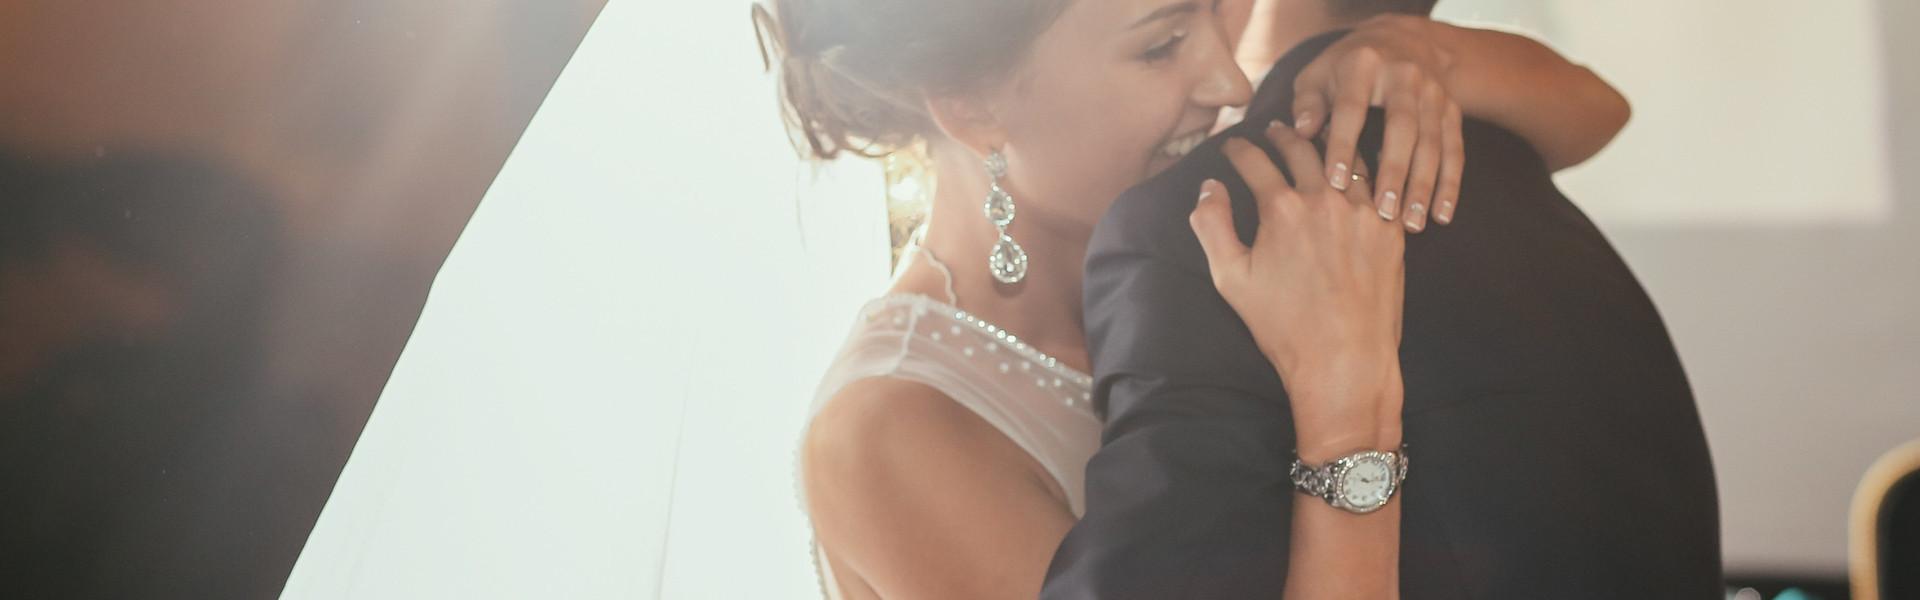 NYC Hotel Weddings | Wedding Reception in NYC